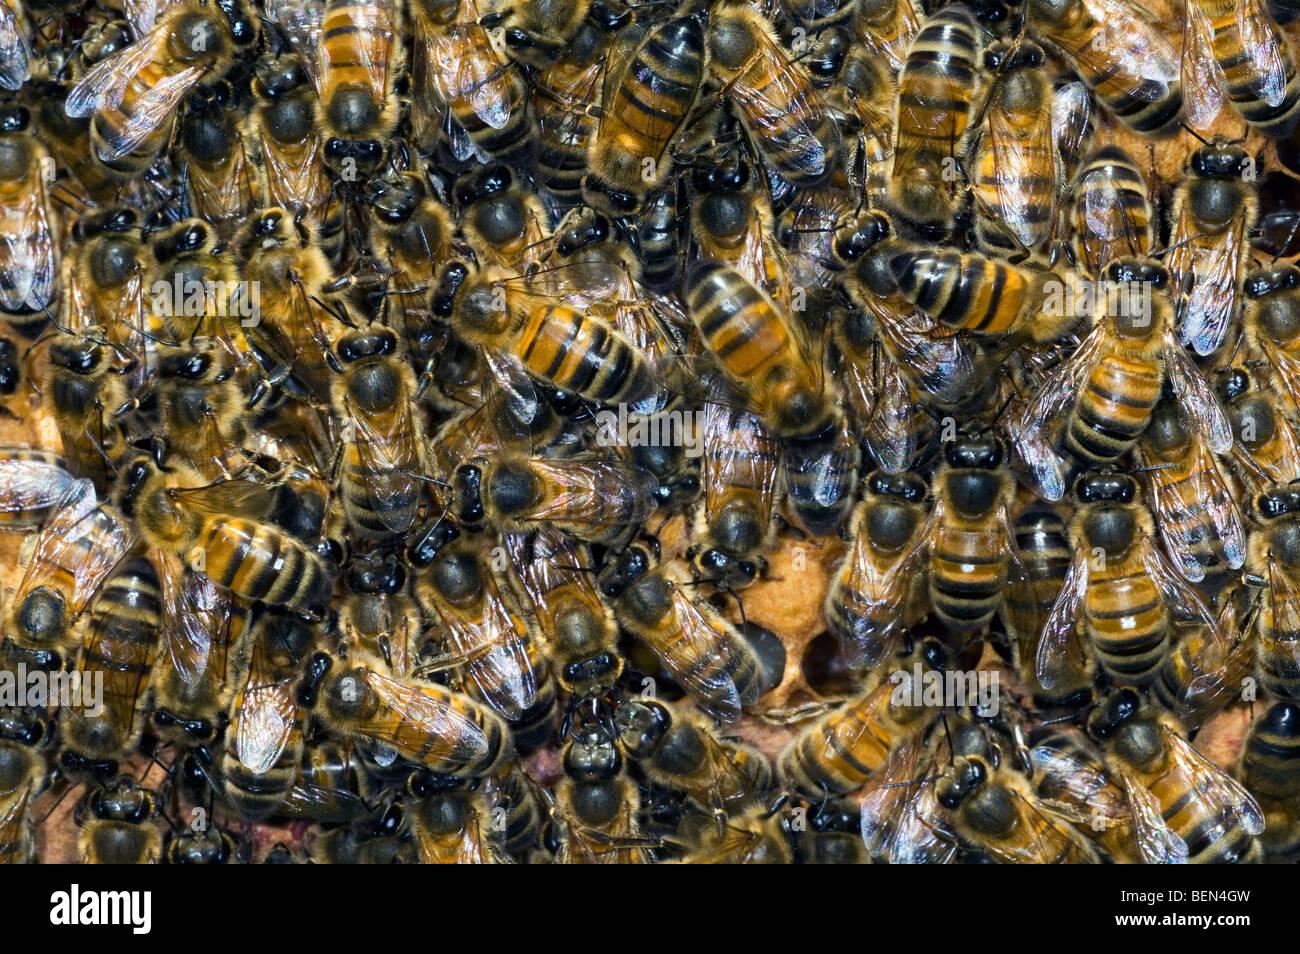 Honey bee workers (Apis mellifera) on honey comb, Belgium - Stock Image